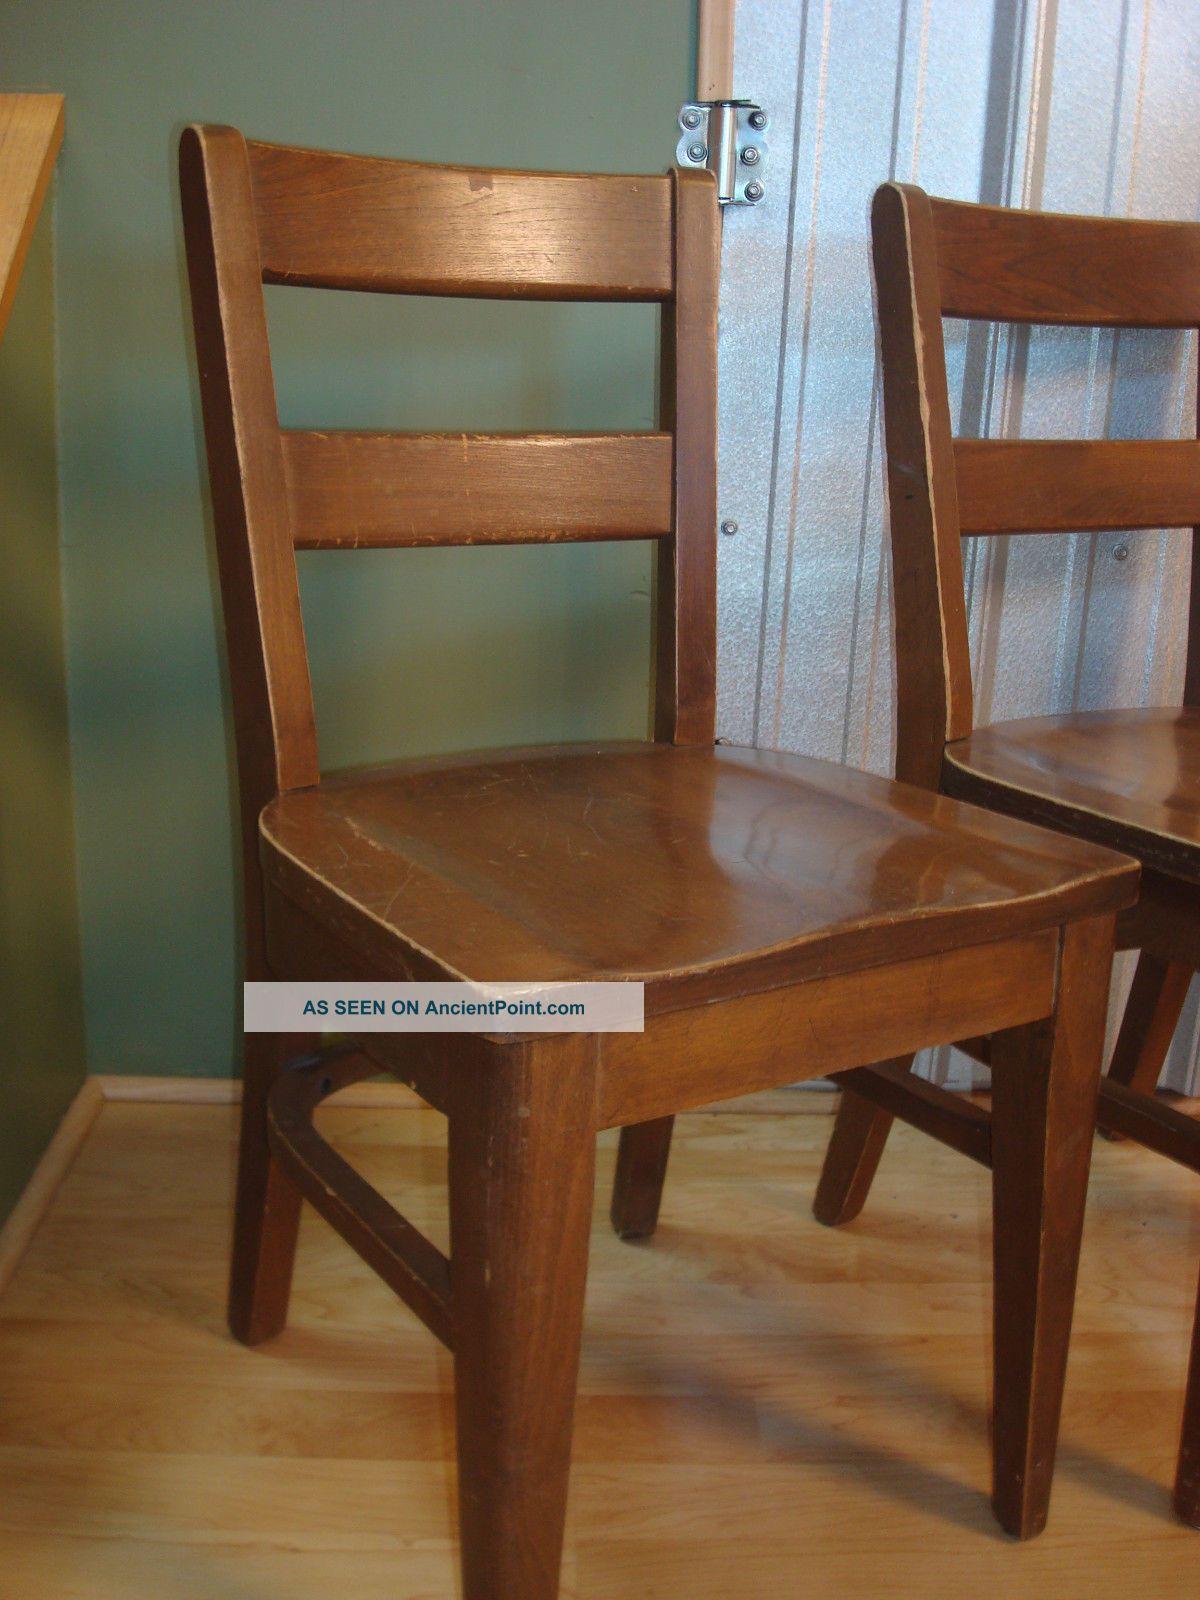 Vintage Childrens Wooden School Chairs Industrial